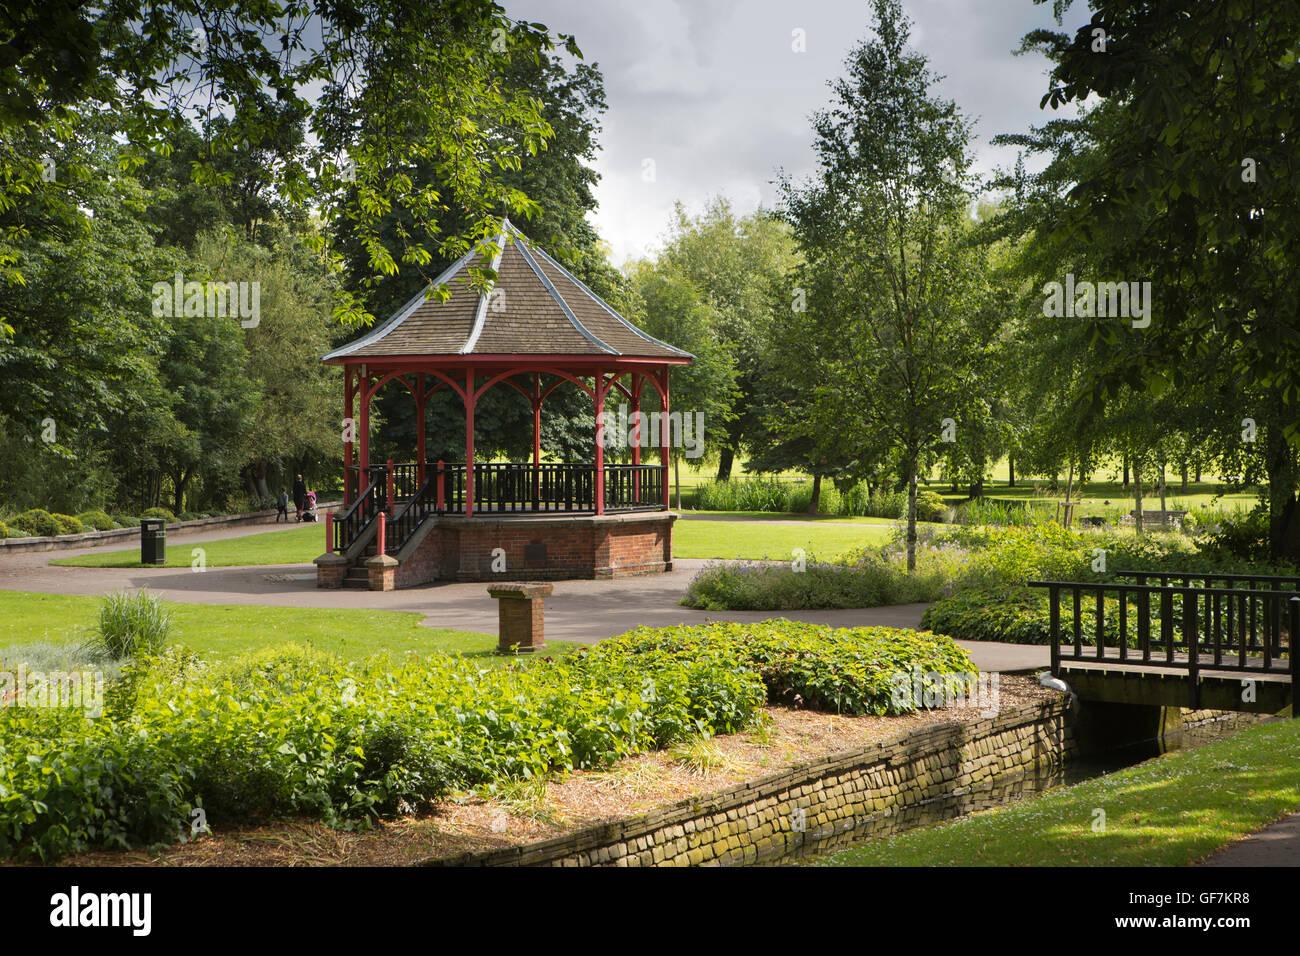 UK, England, Norfolk, King's Lynn, The Walks public park, Vancouver Gardens bandstand - Stock Image